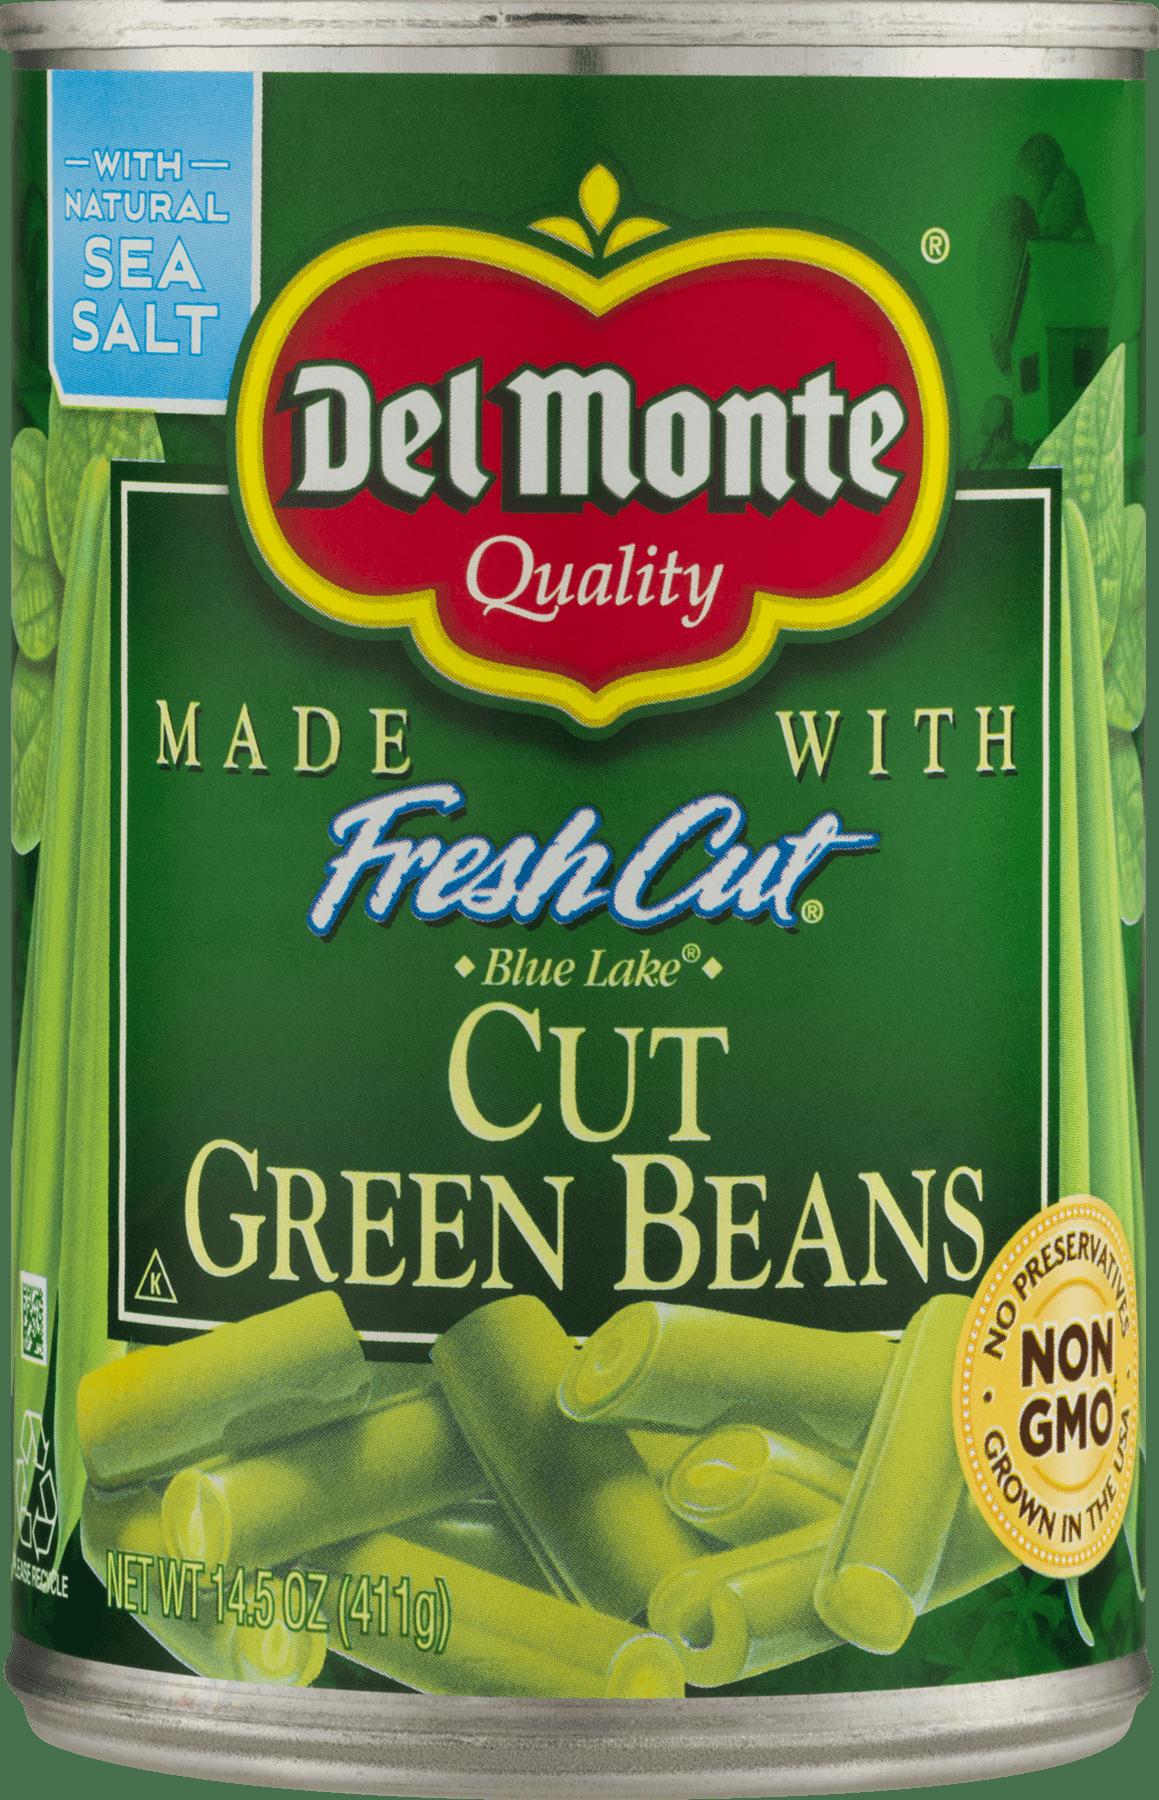 Del Monte Green Beans Cuts, 14.5 Oz by Del Monte Foods Inc